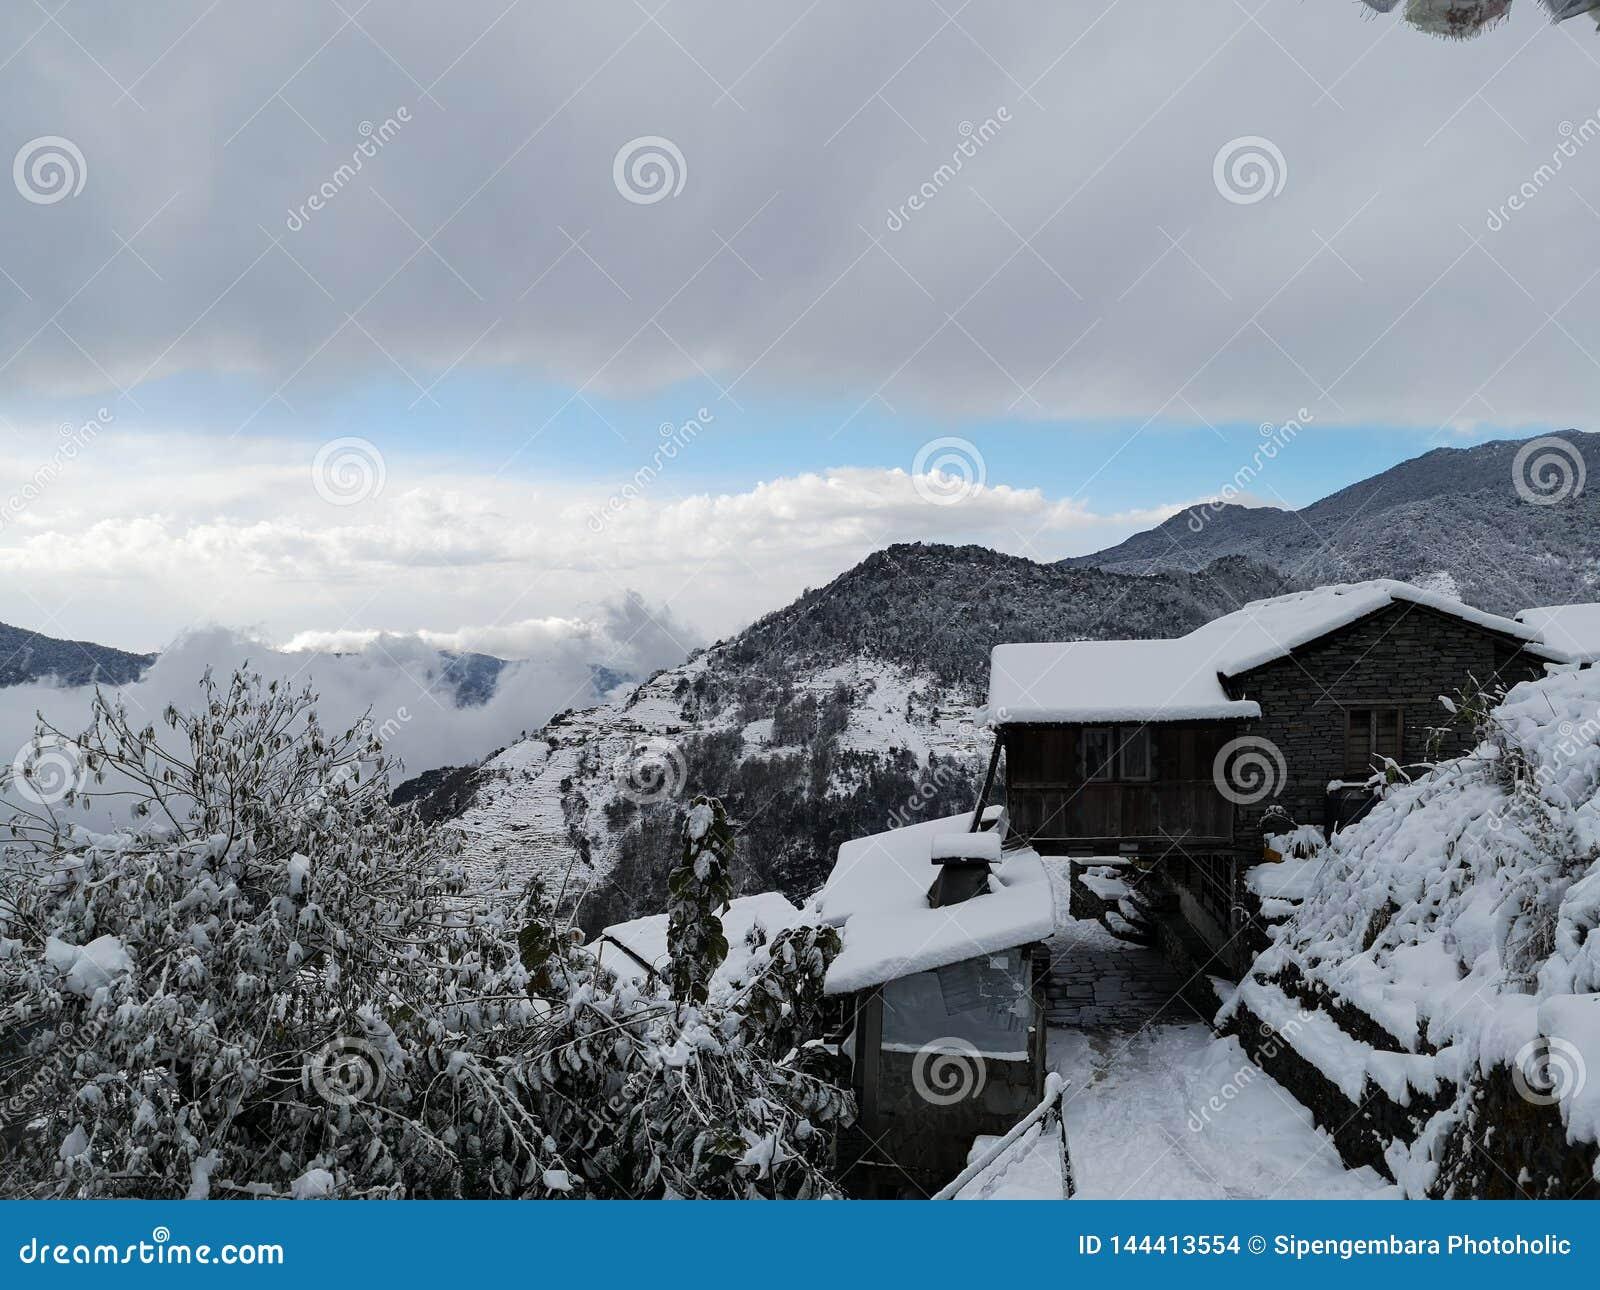 Ghandruk - μόνο χάστε τον ήλιο όταν αρχίζει στο χιόνι